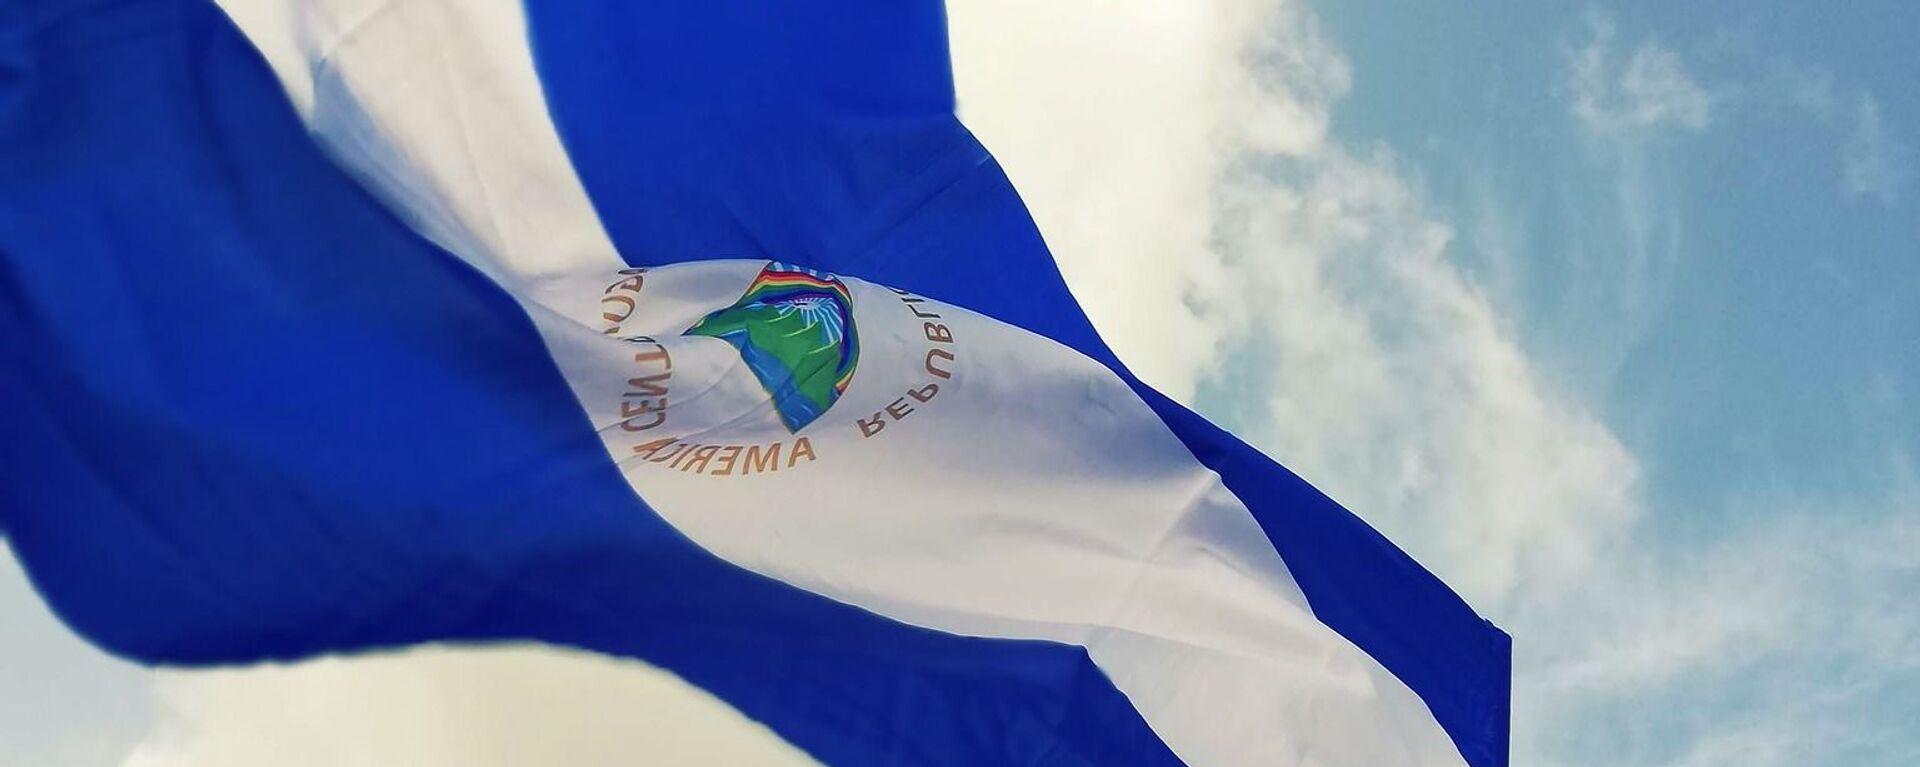 Bandera de Nicaragua - Sputnik Mundo, 1920, 10.09.2021